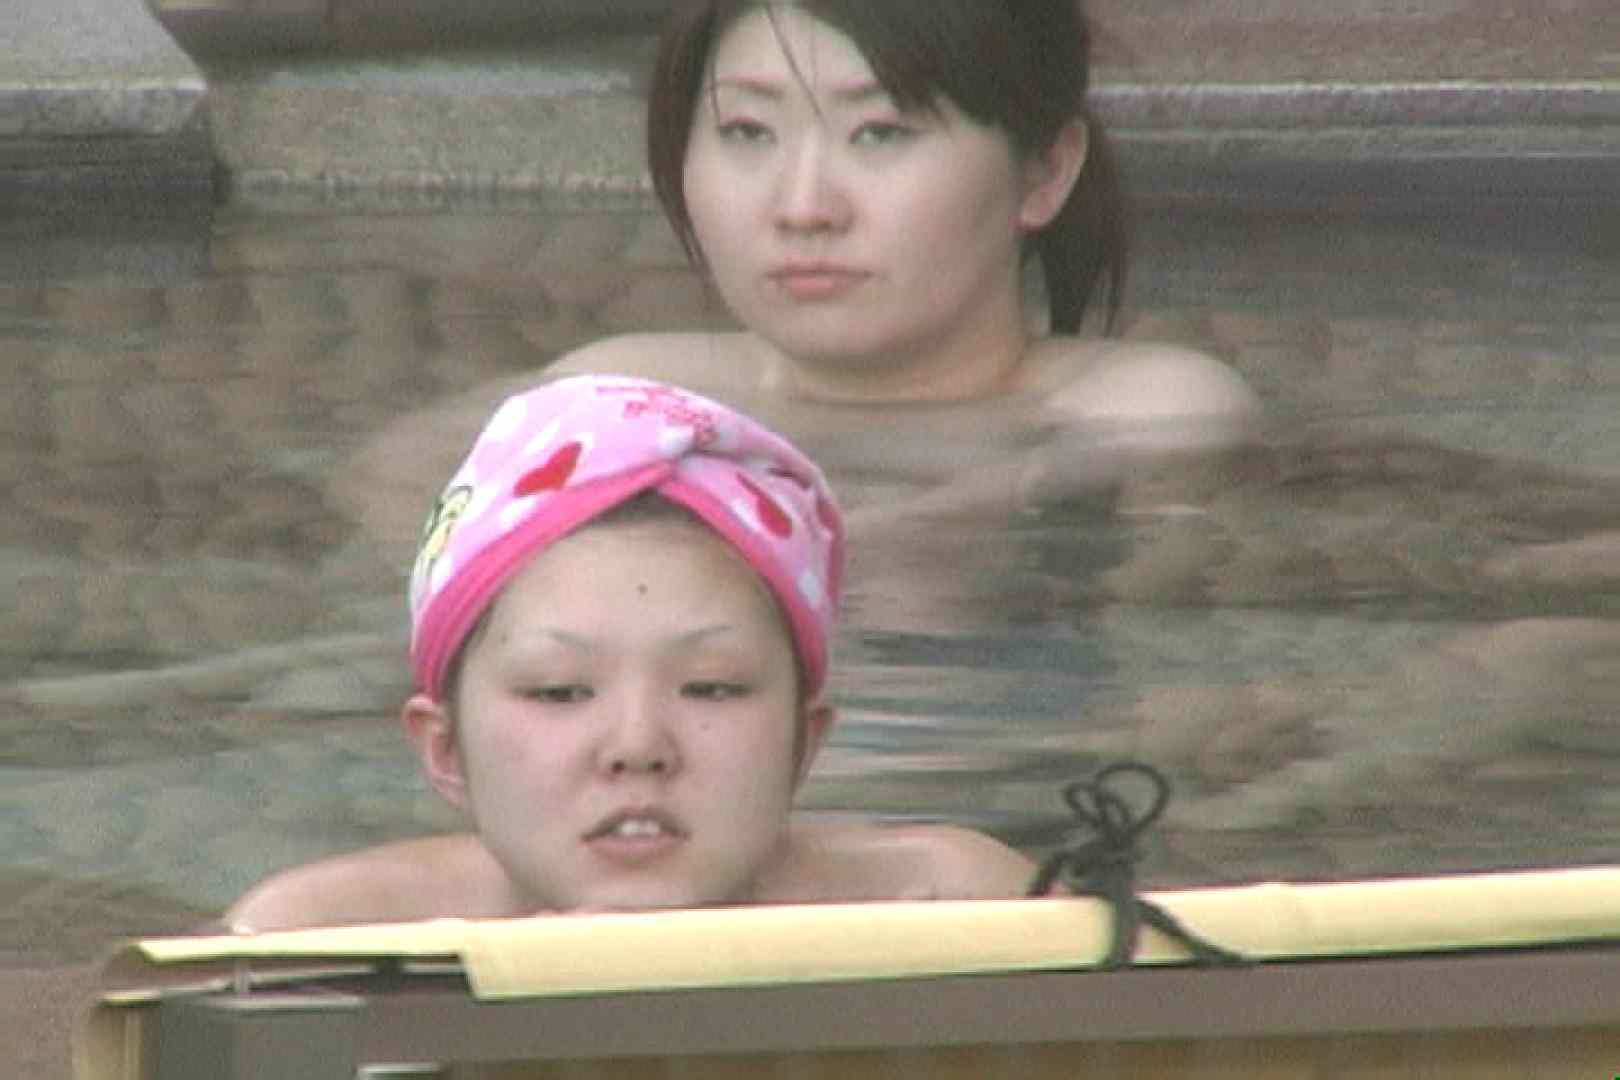 Aquaな露天風呂Vol.25 露天風呂編  91PIX 54